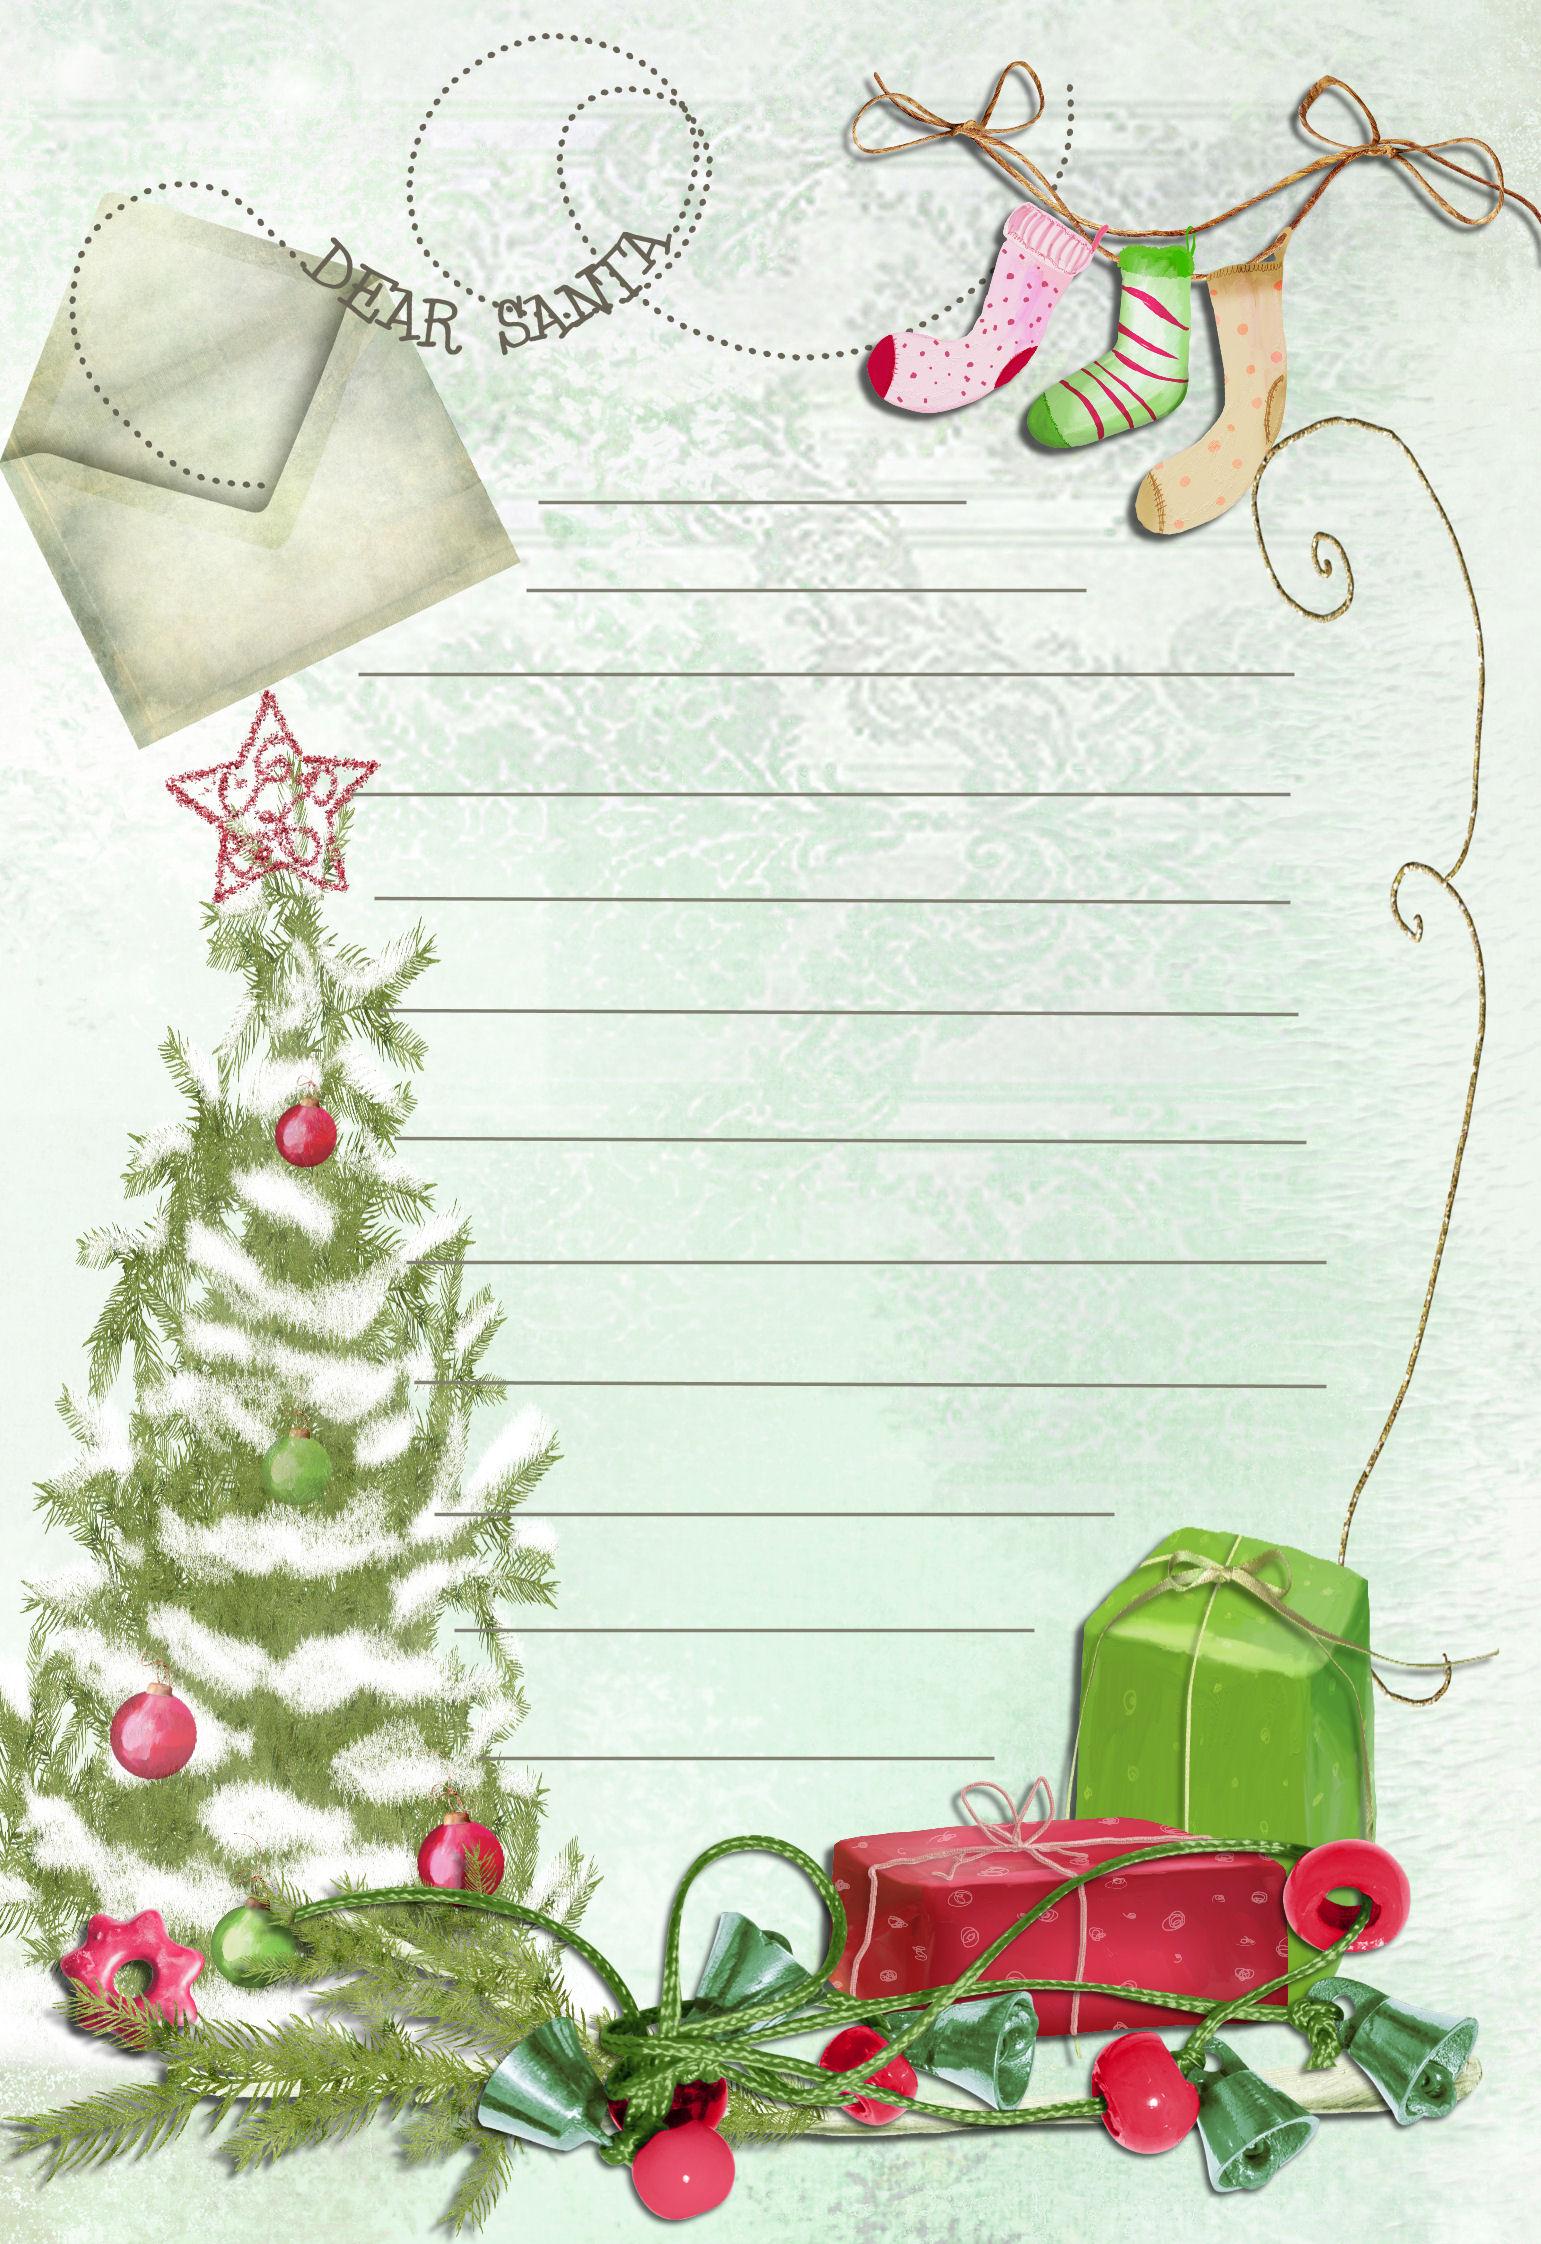 19 free printable christmas letter templates images free for Free christmas templates